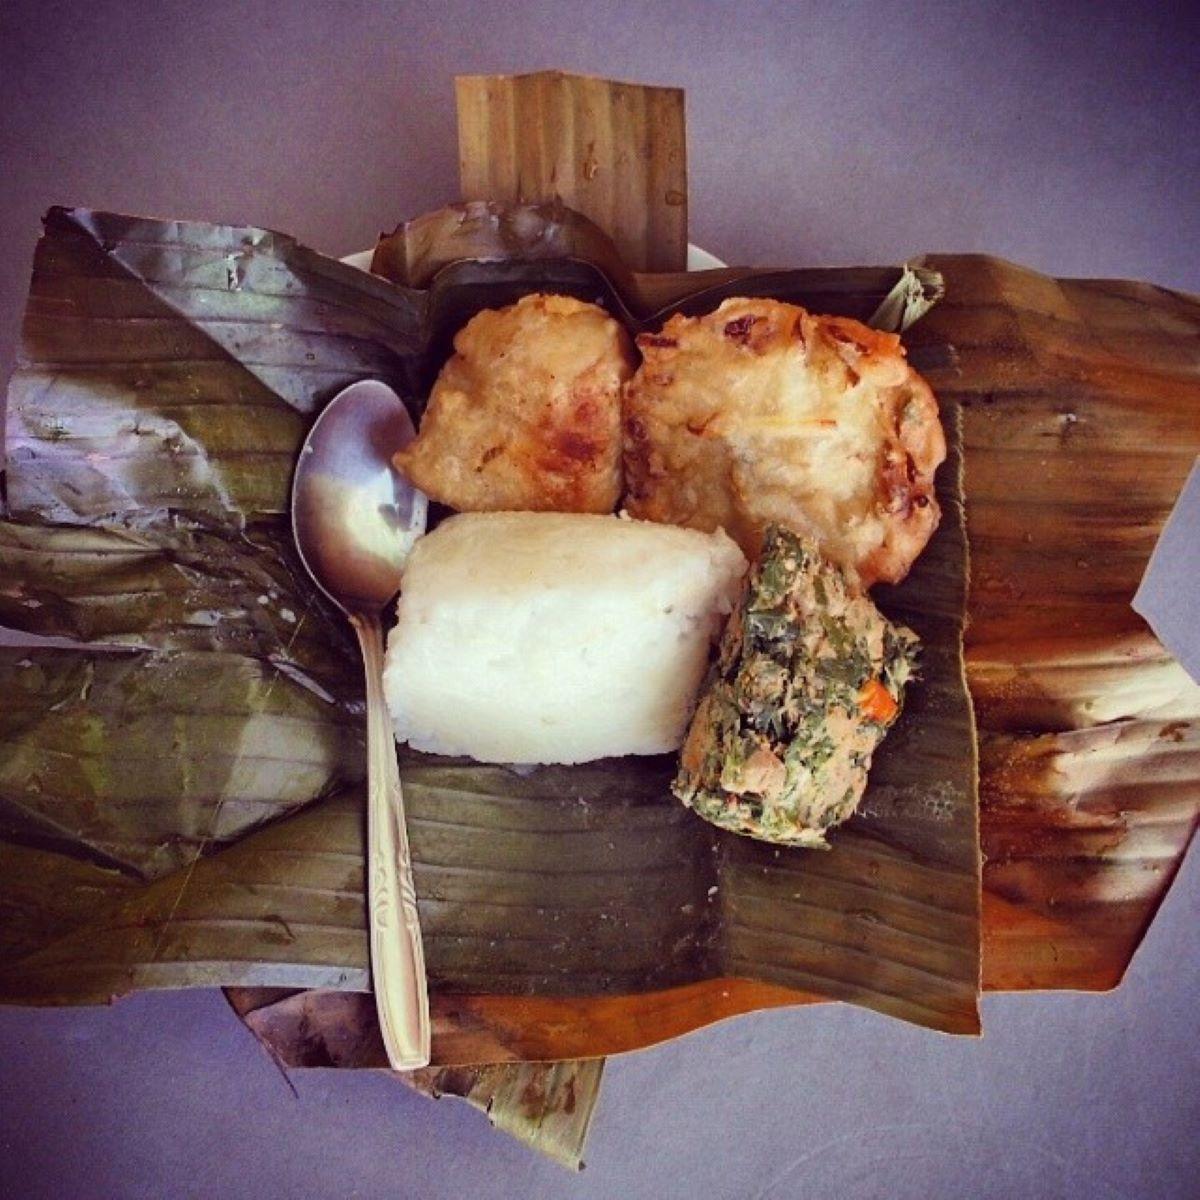 Mencicipi Nasi Menok dan Tepo Tahu, Hidangan Tradisional Khas Magetan